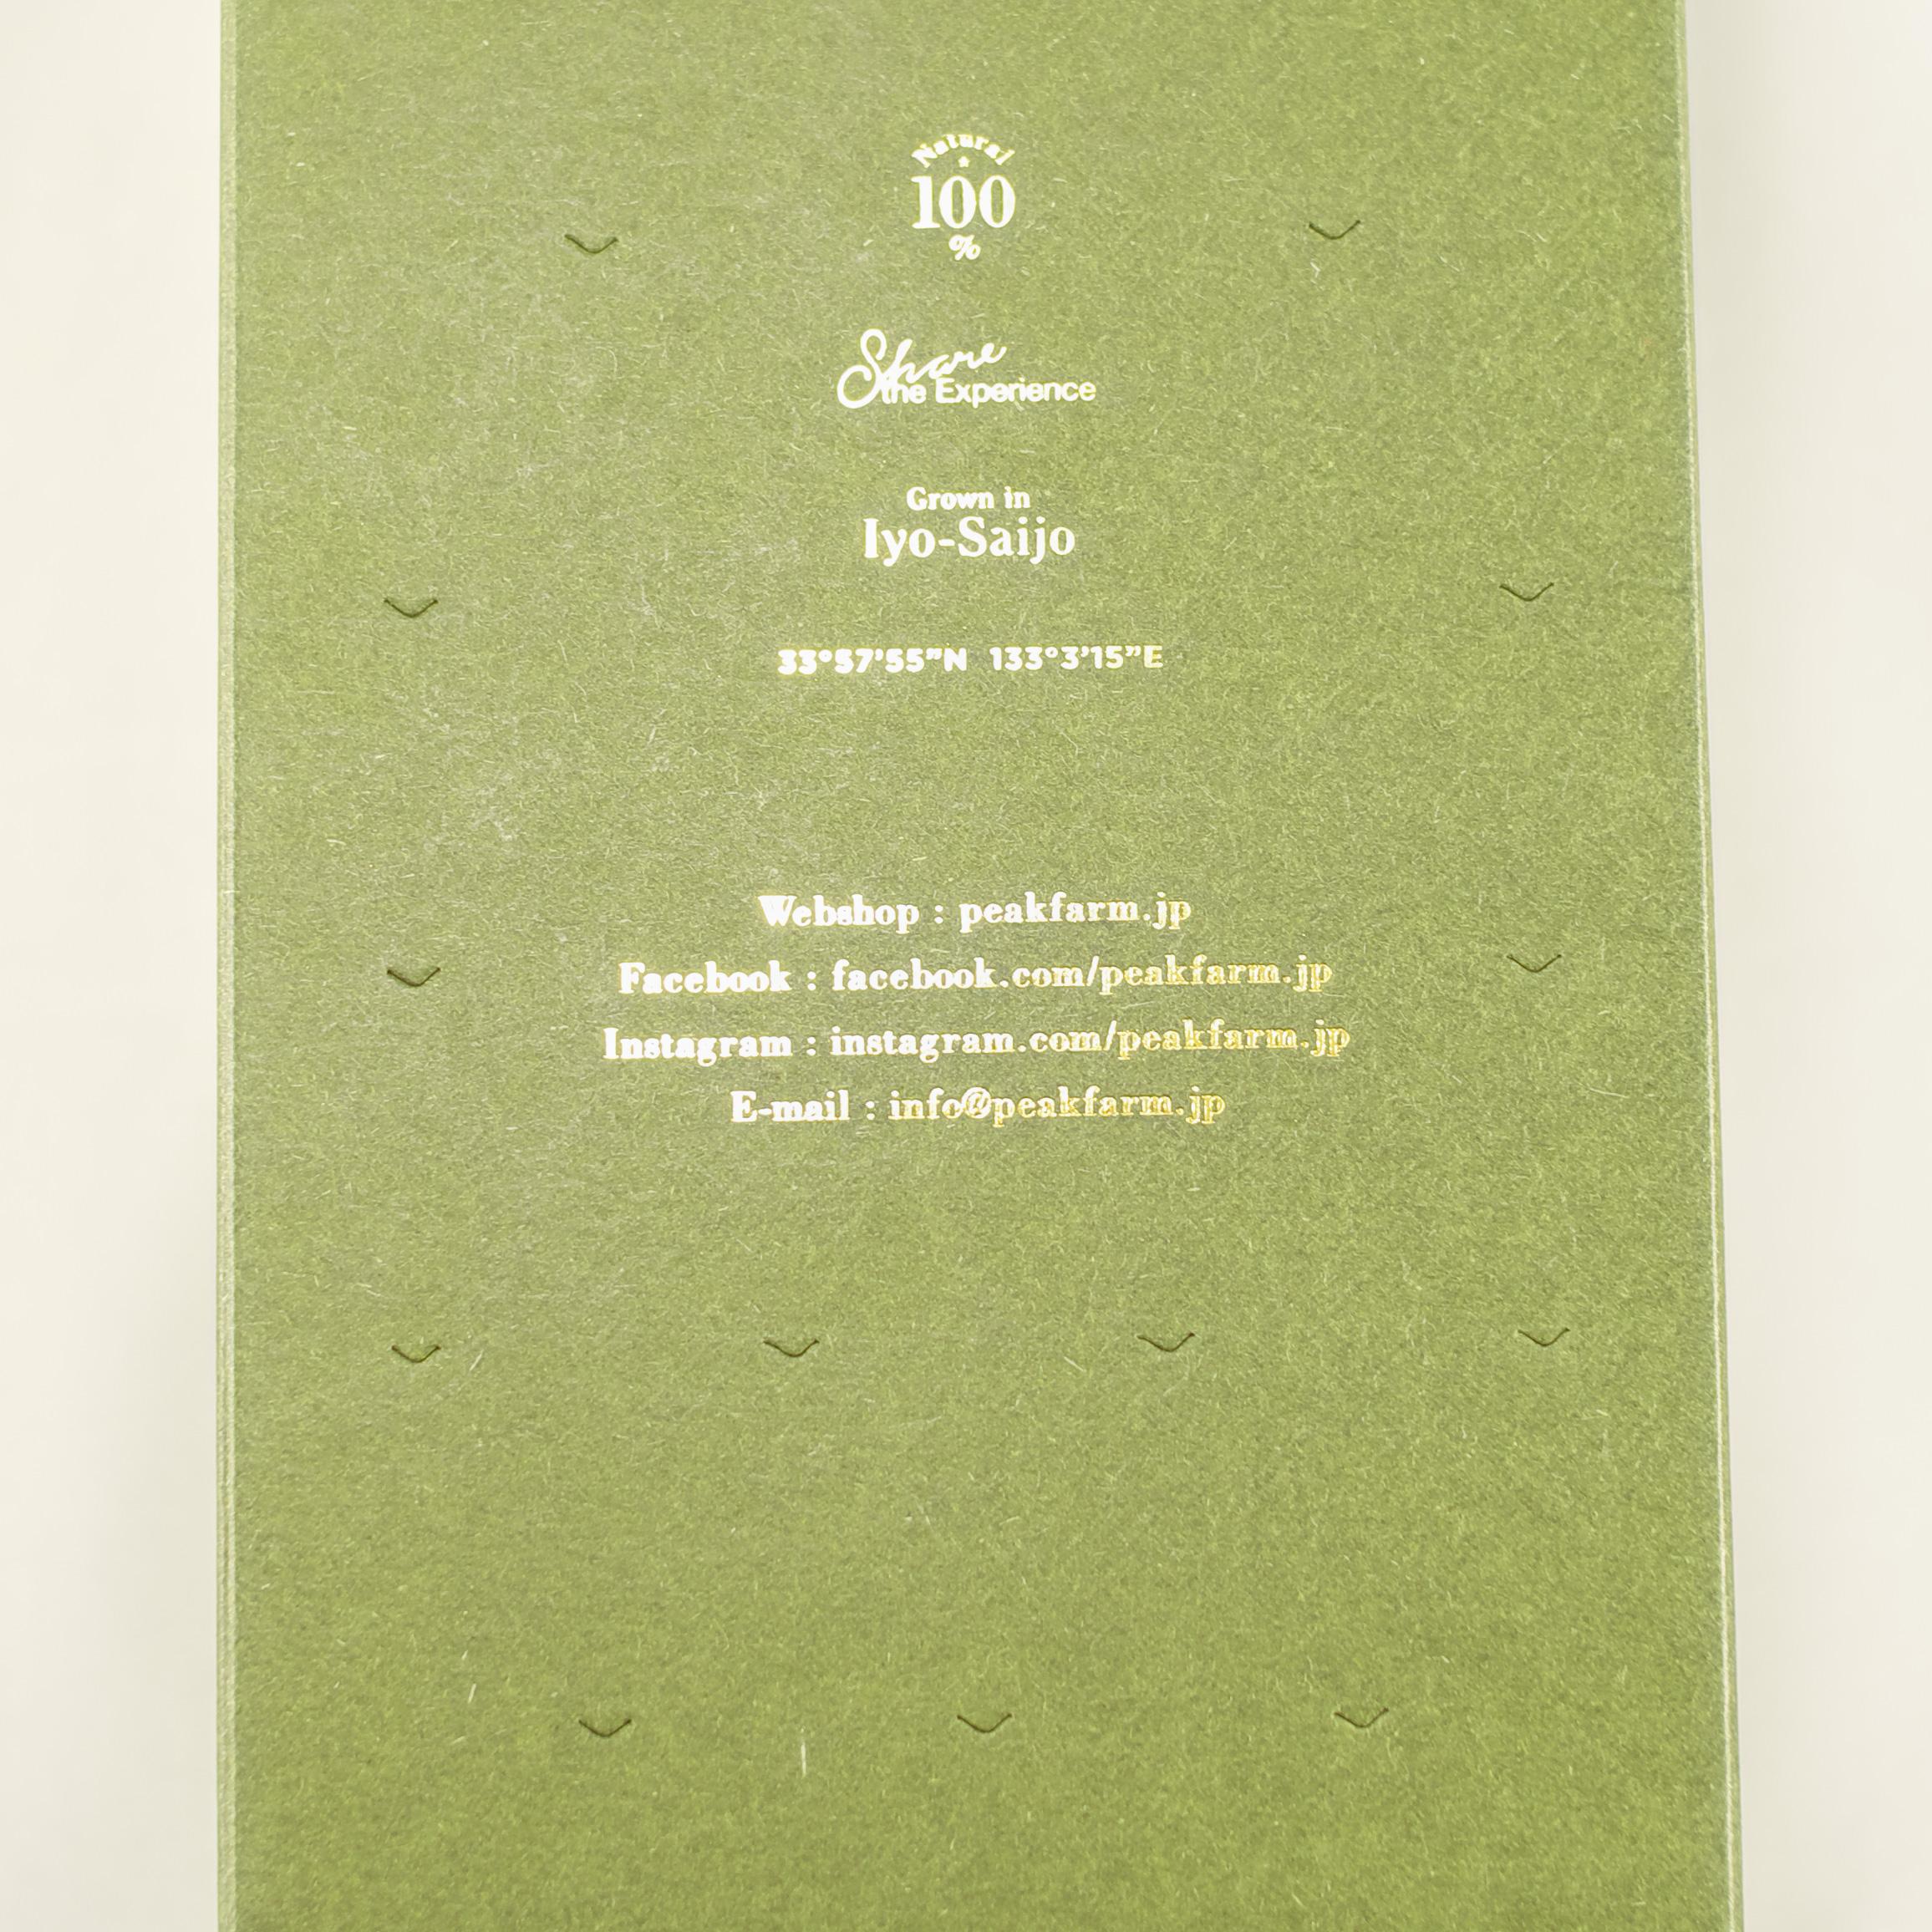 peakfarm伊予西条イタリアンギフトセット(3個入り)